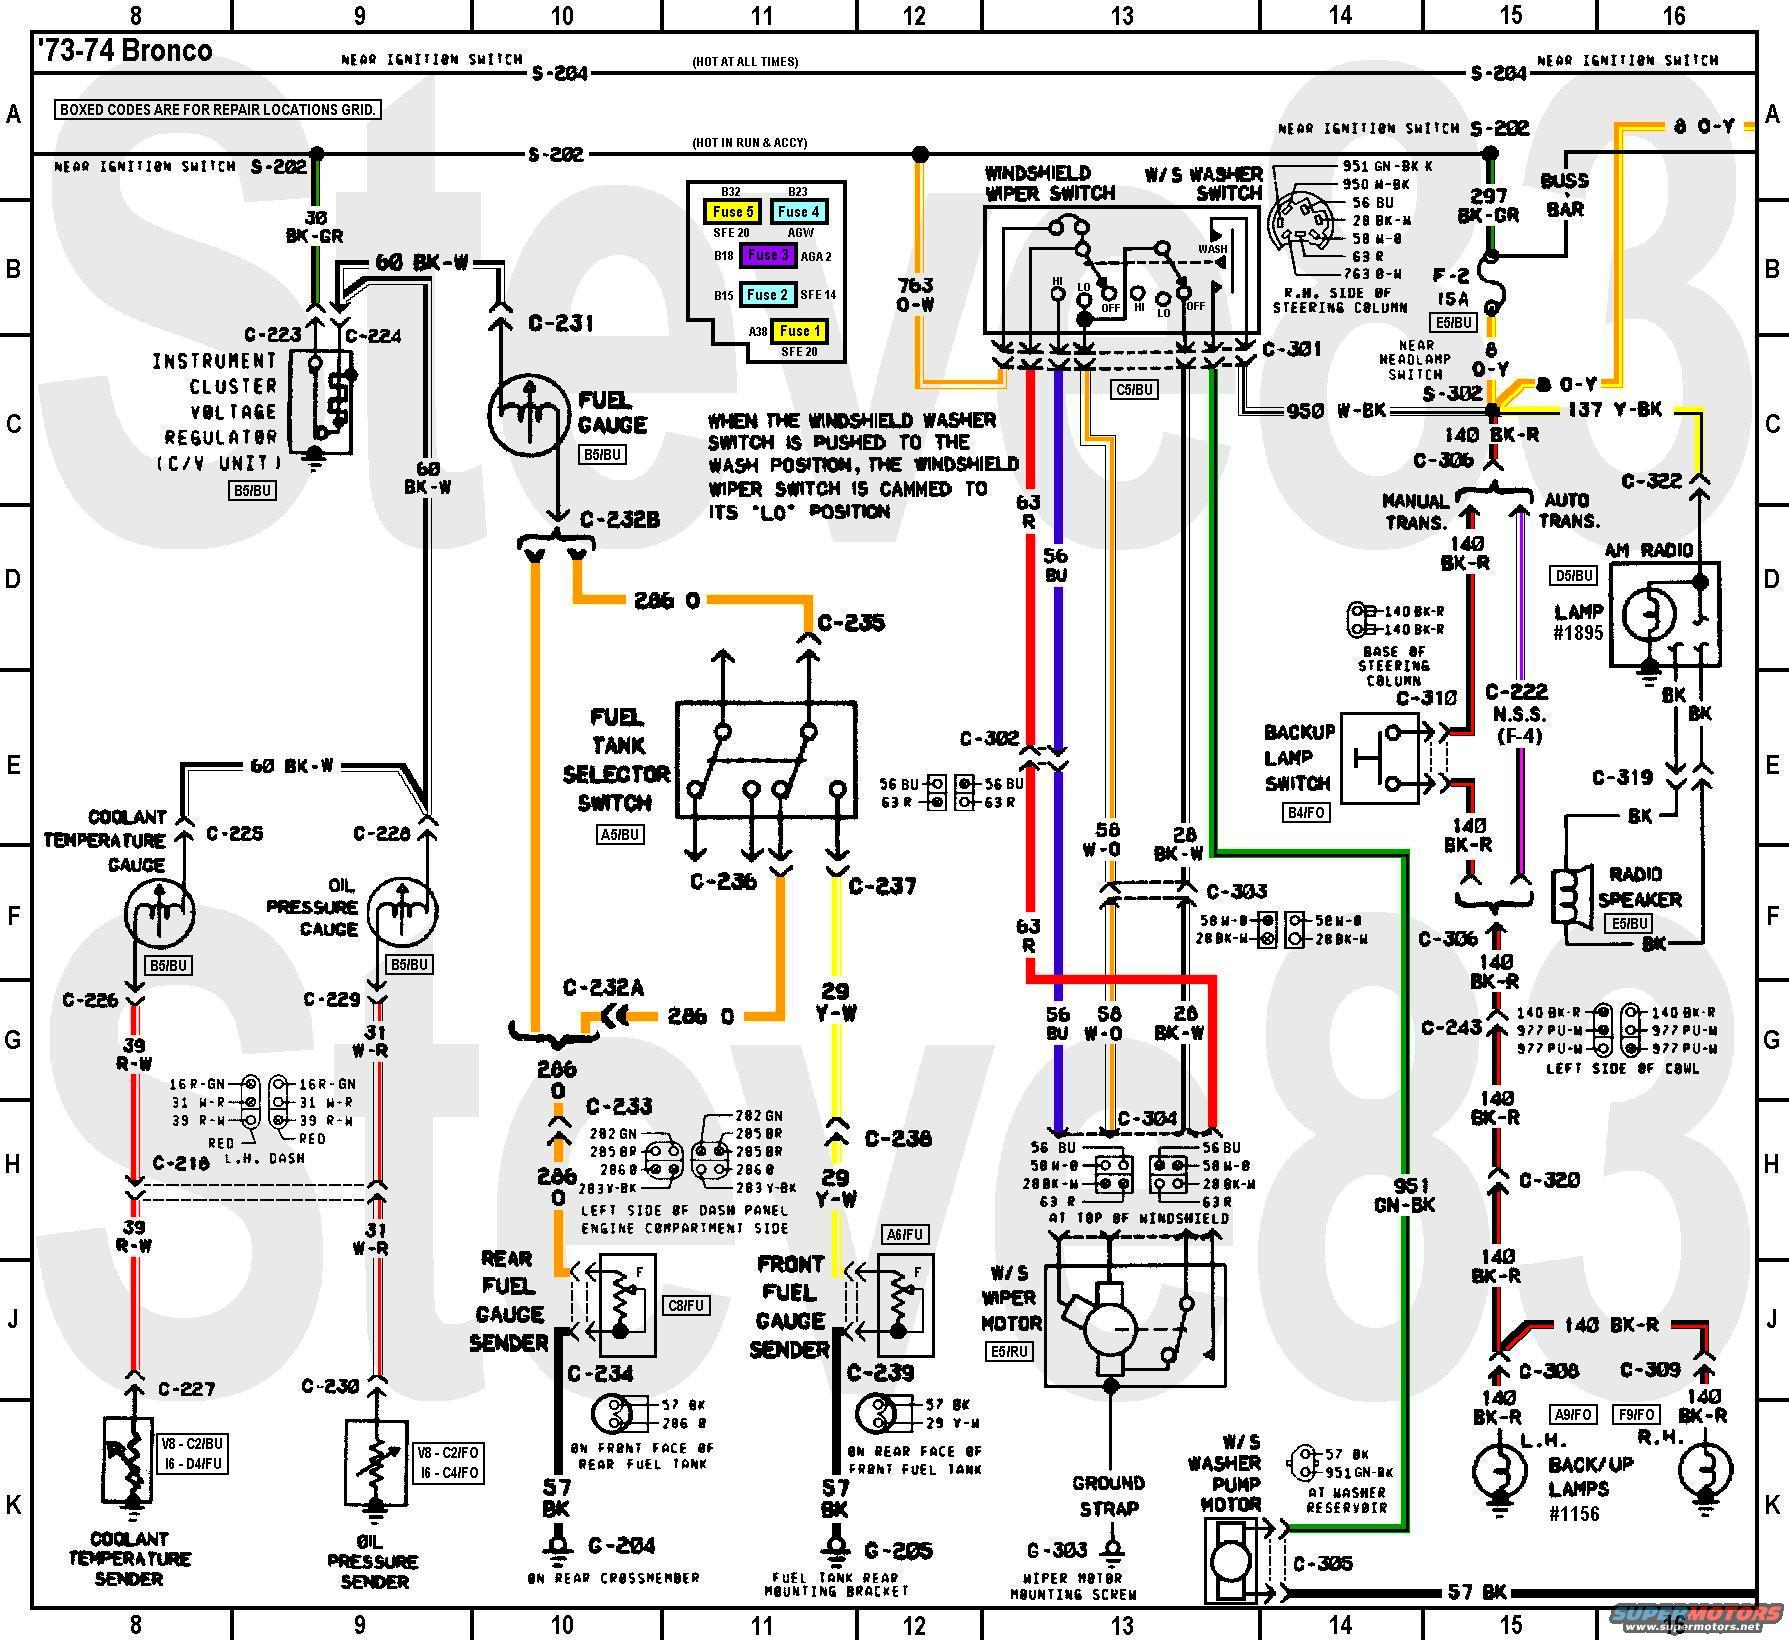 Wiring Diagram Ford Laser 1990 Library 02 F 150 Radio 2006 Mitsubishi Eclipse 44 1993